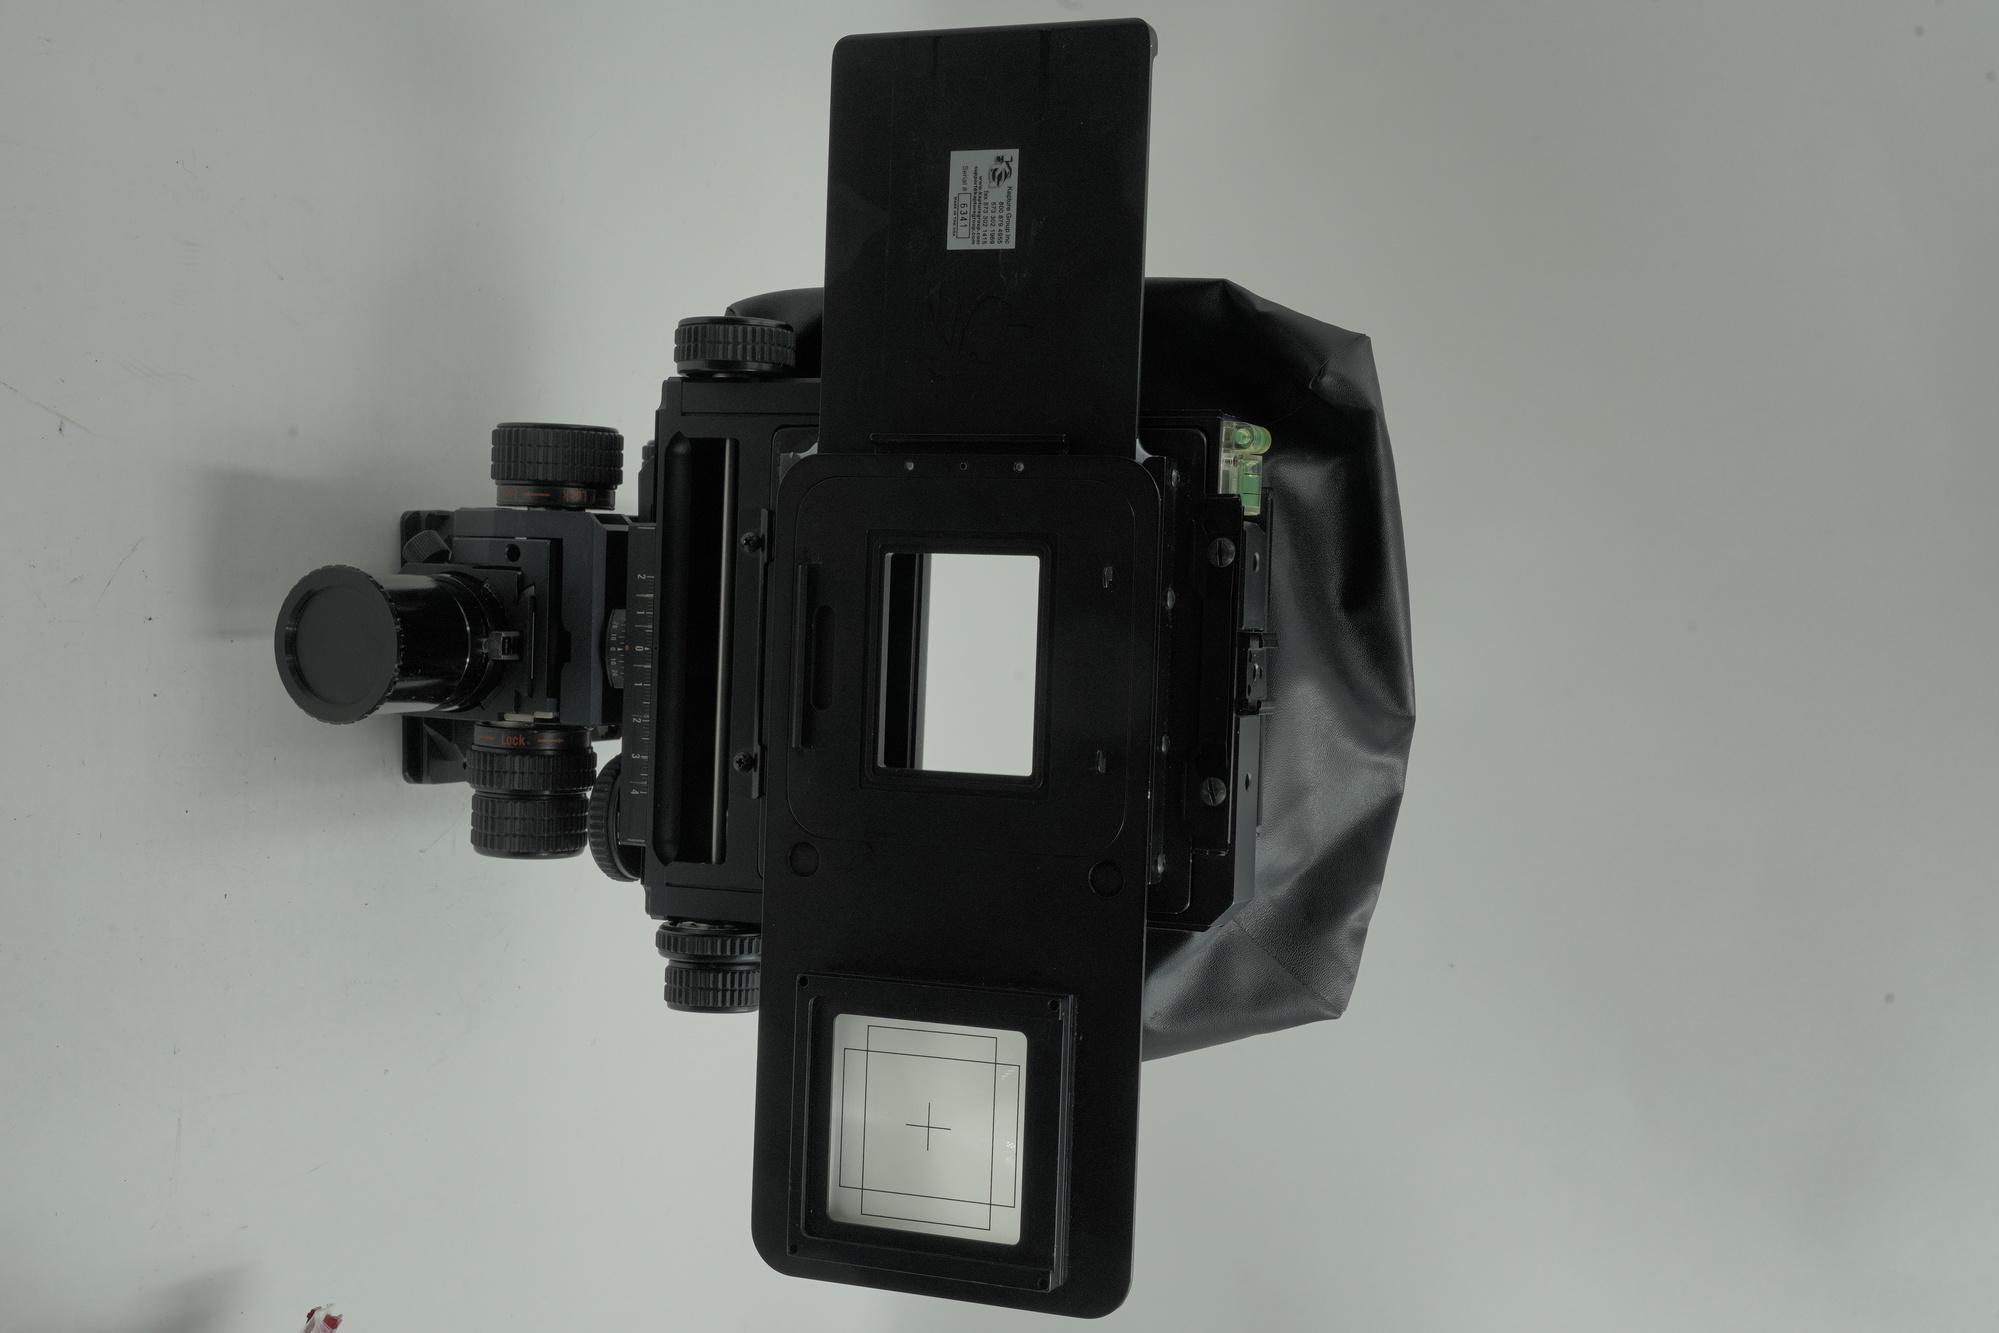 FS: Toyo VX23D Digital View Camera And AAccessories